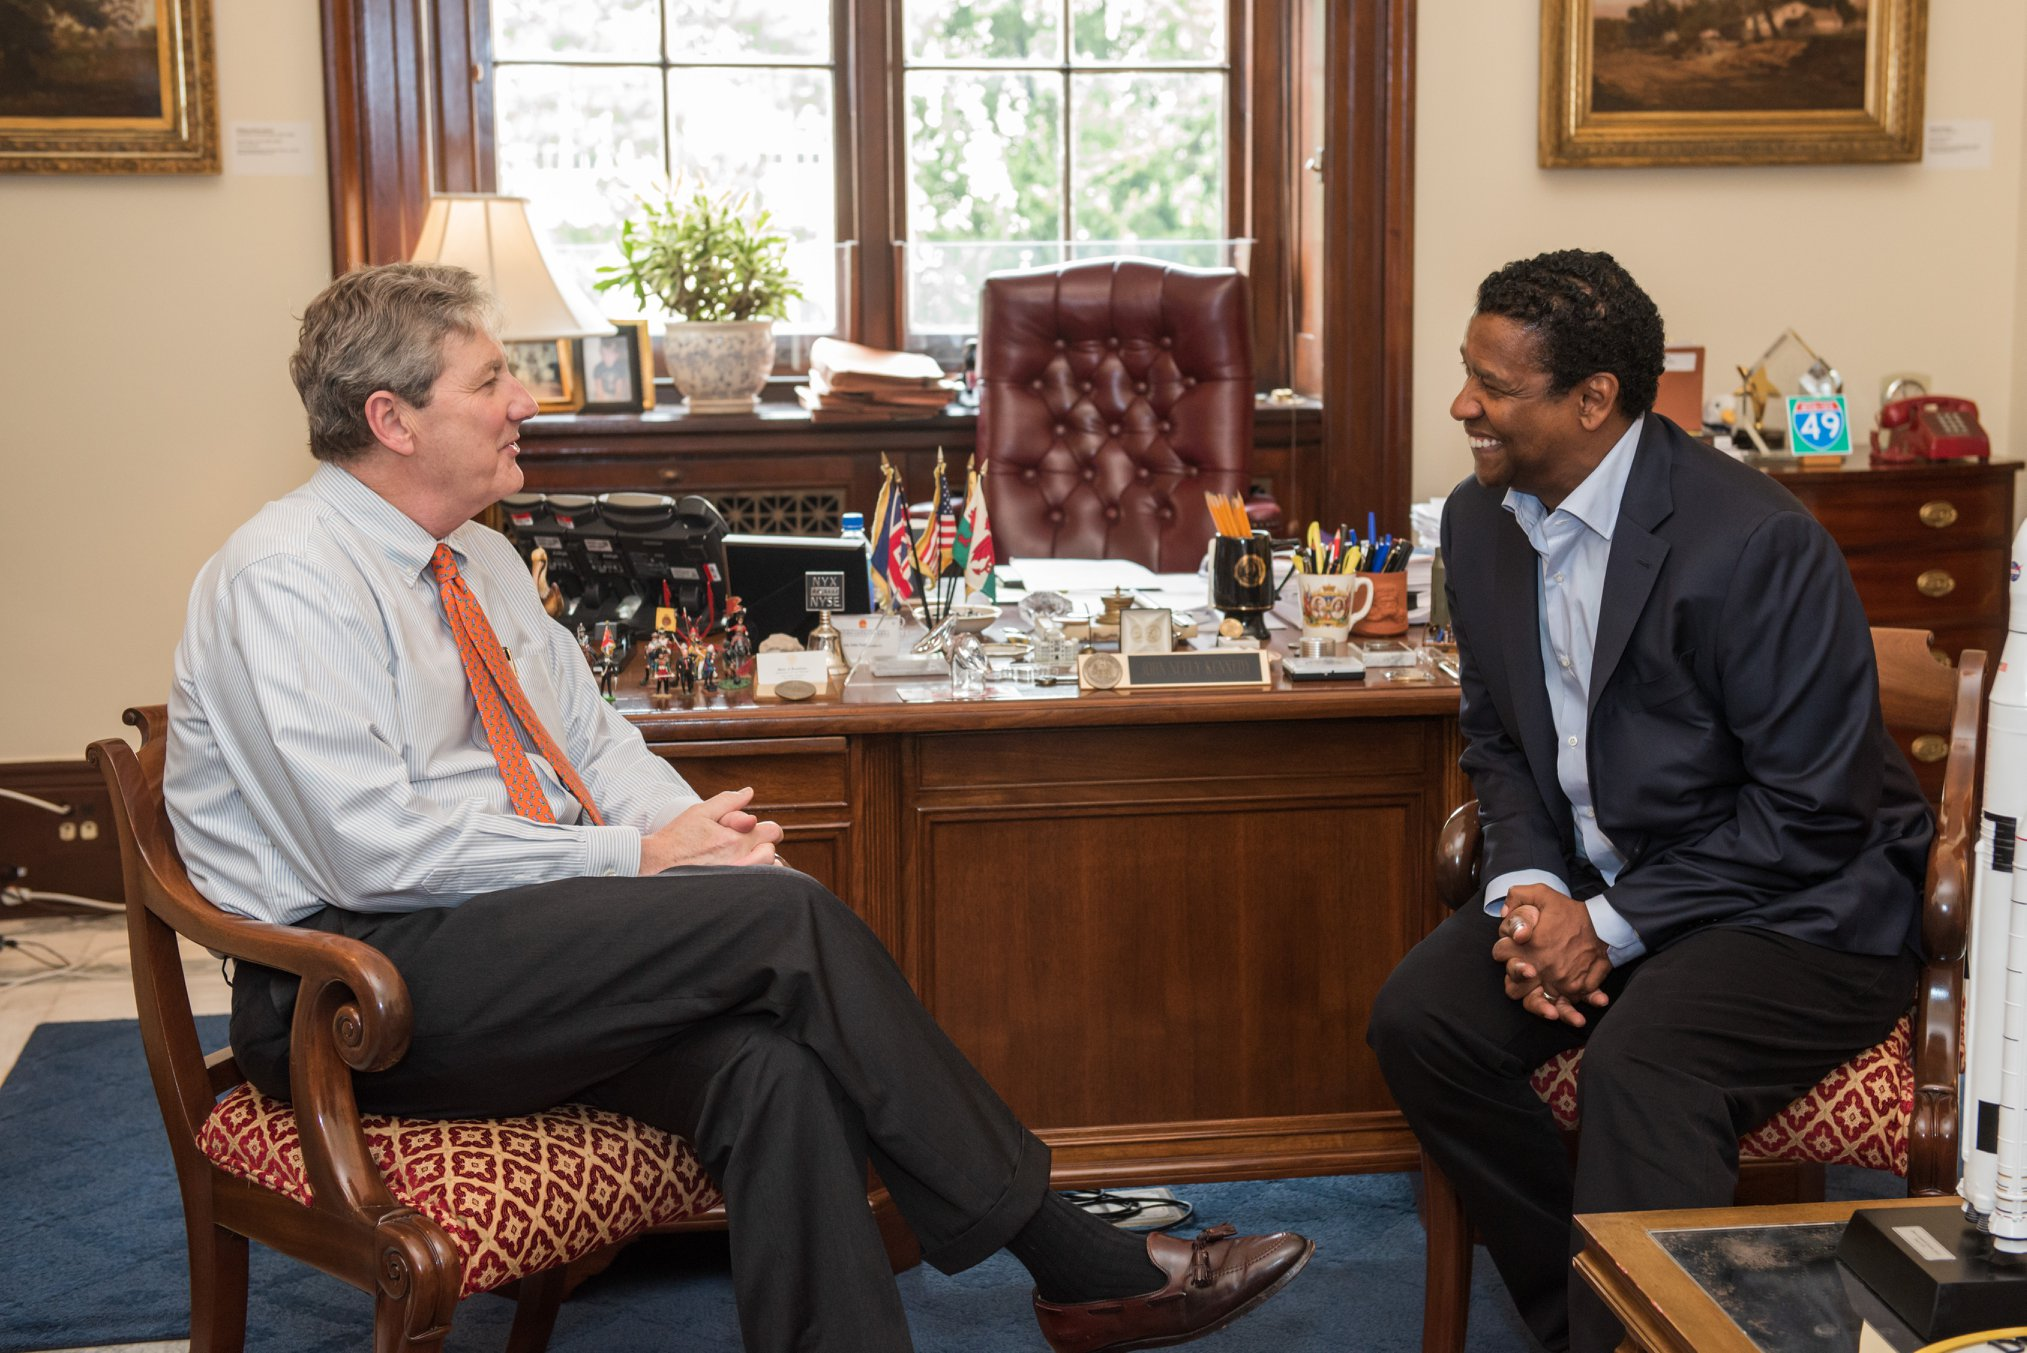 Kennedy And Washington_1537963816841.jpg.jpg